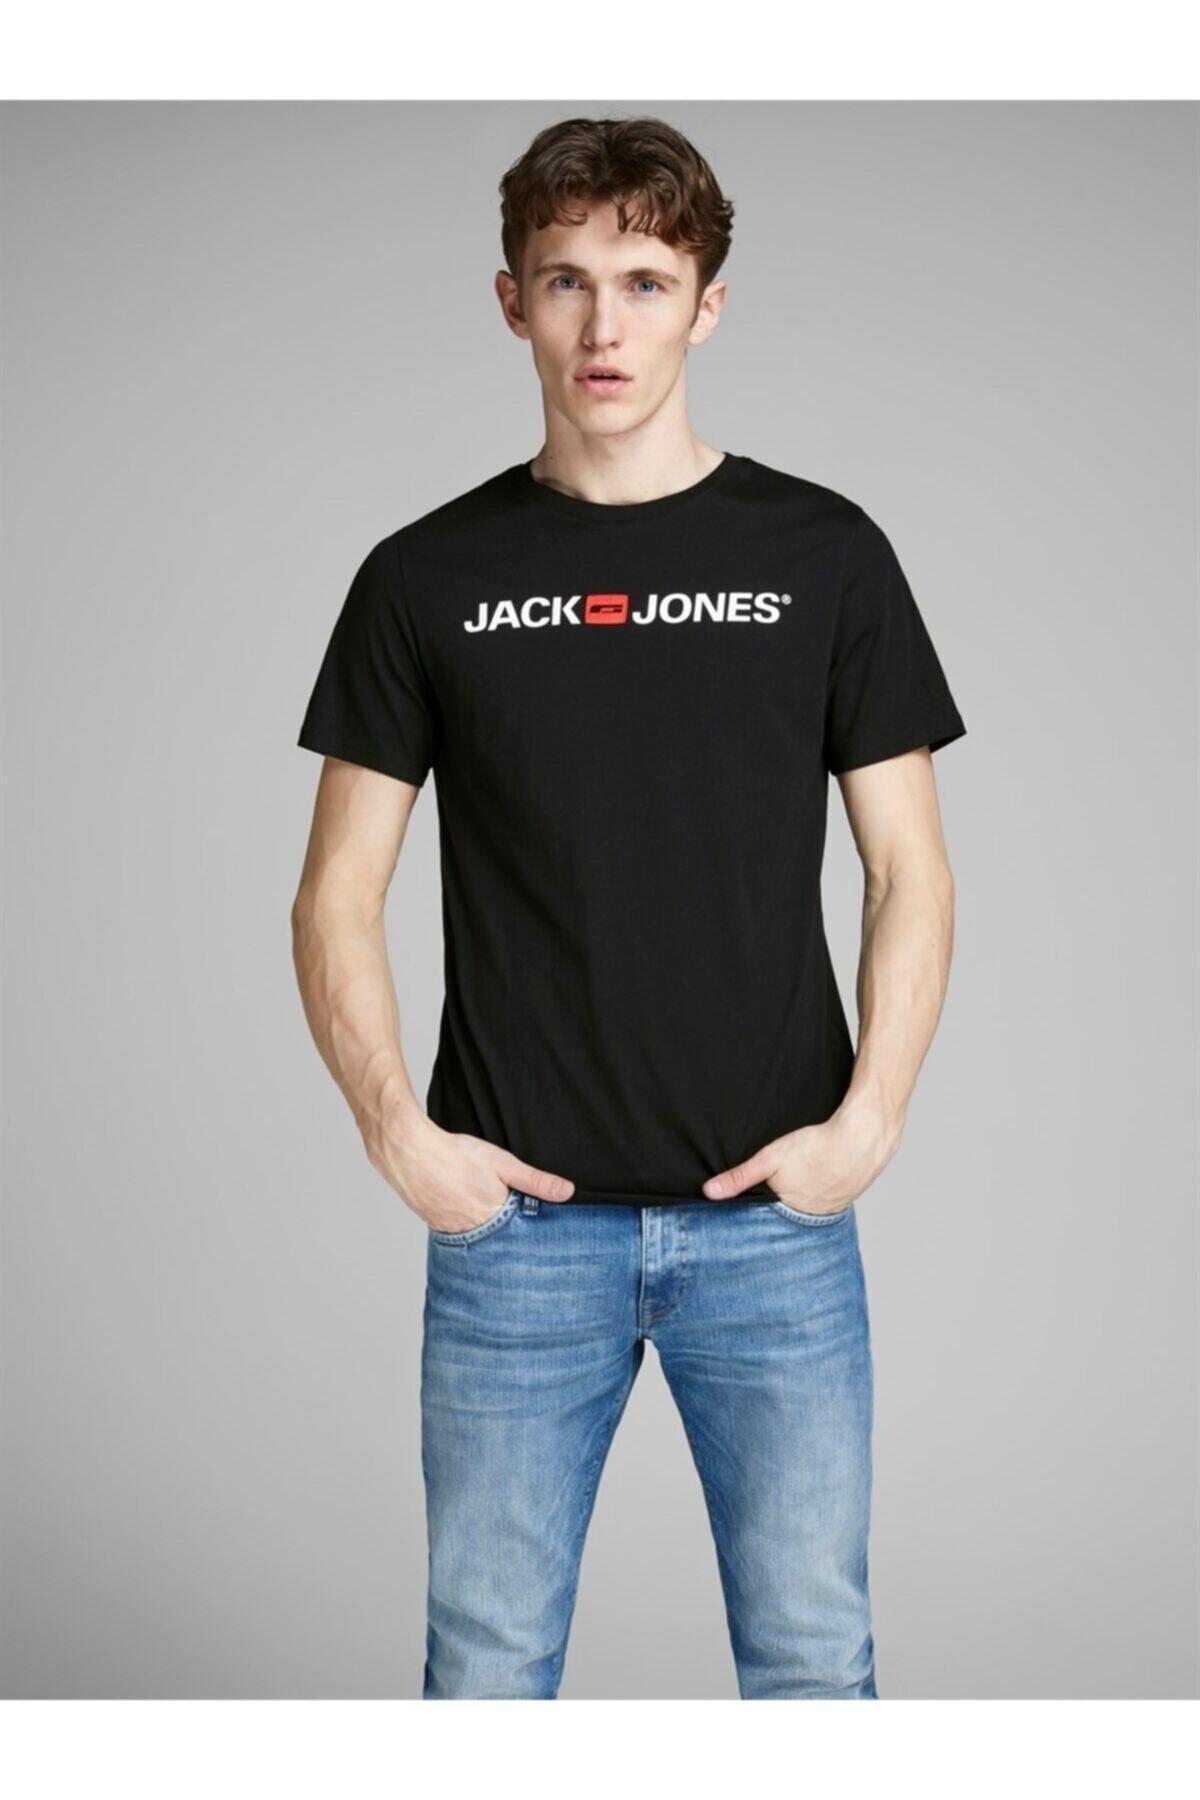 Jack & Jones Jack Jones Logo Crew Neck Noos Erkek Tshirt 12137126sg 2